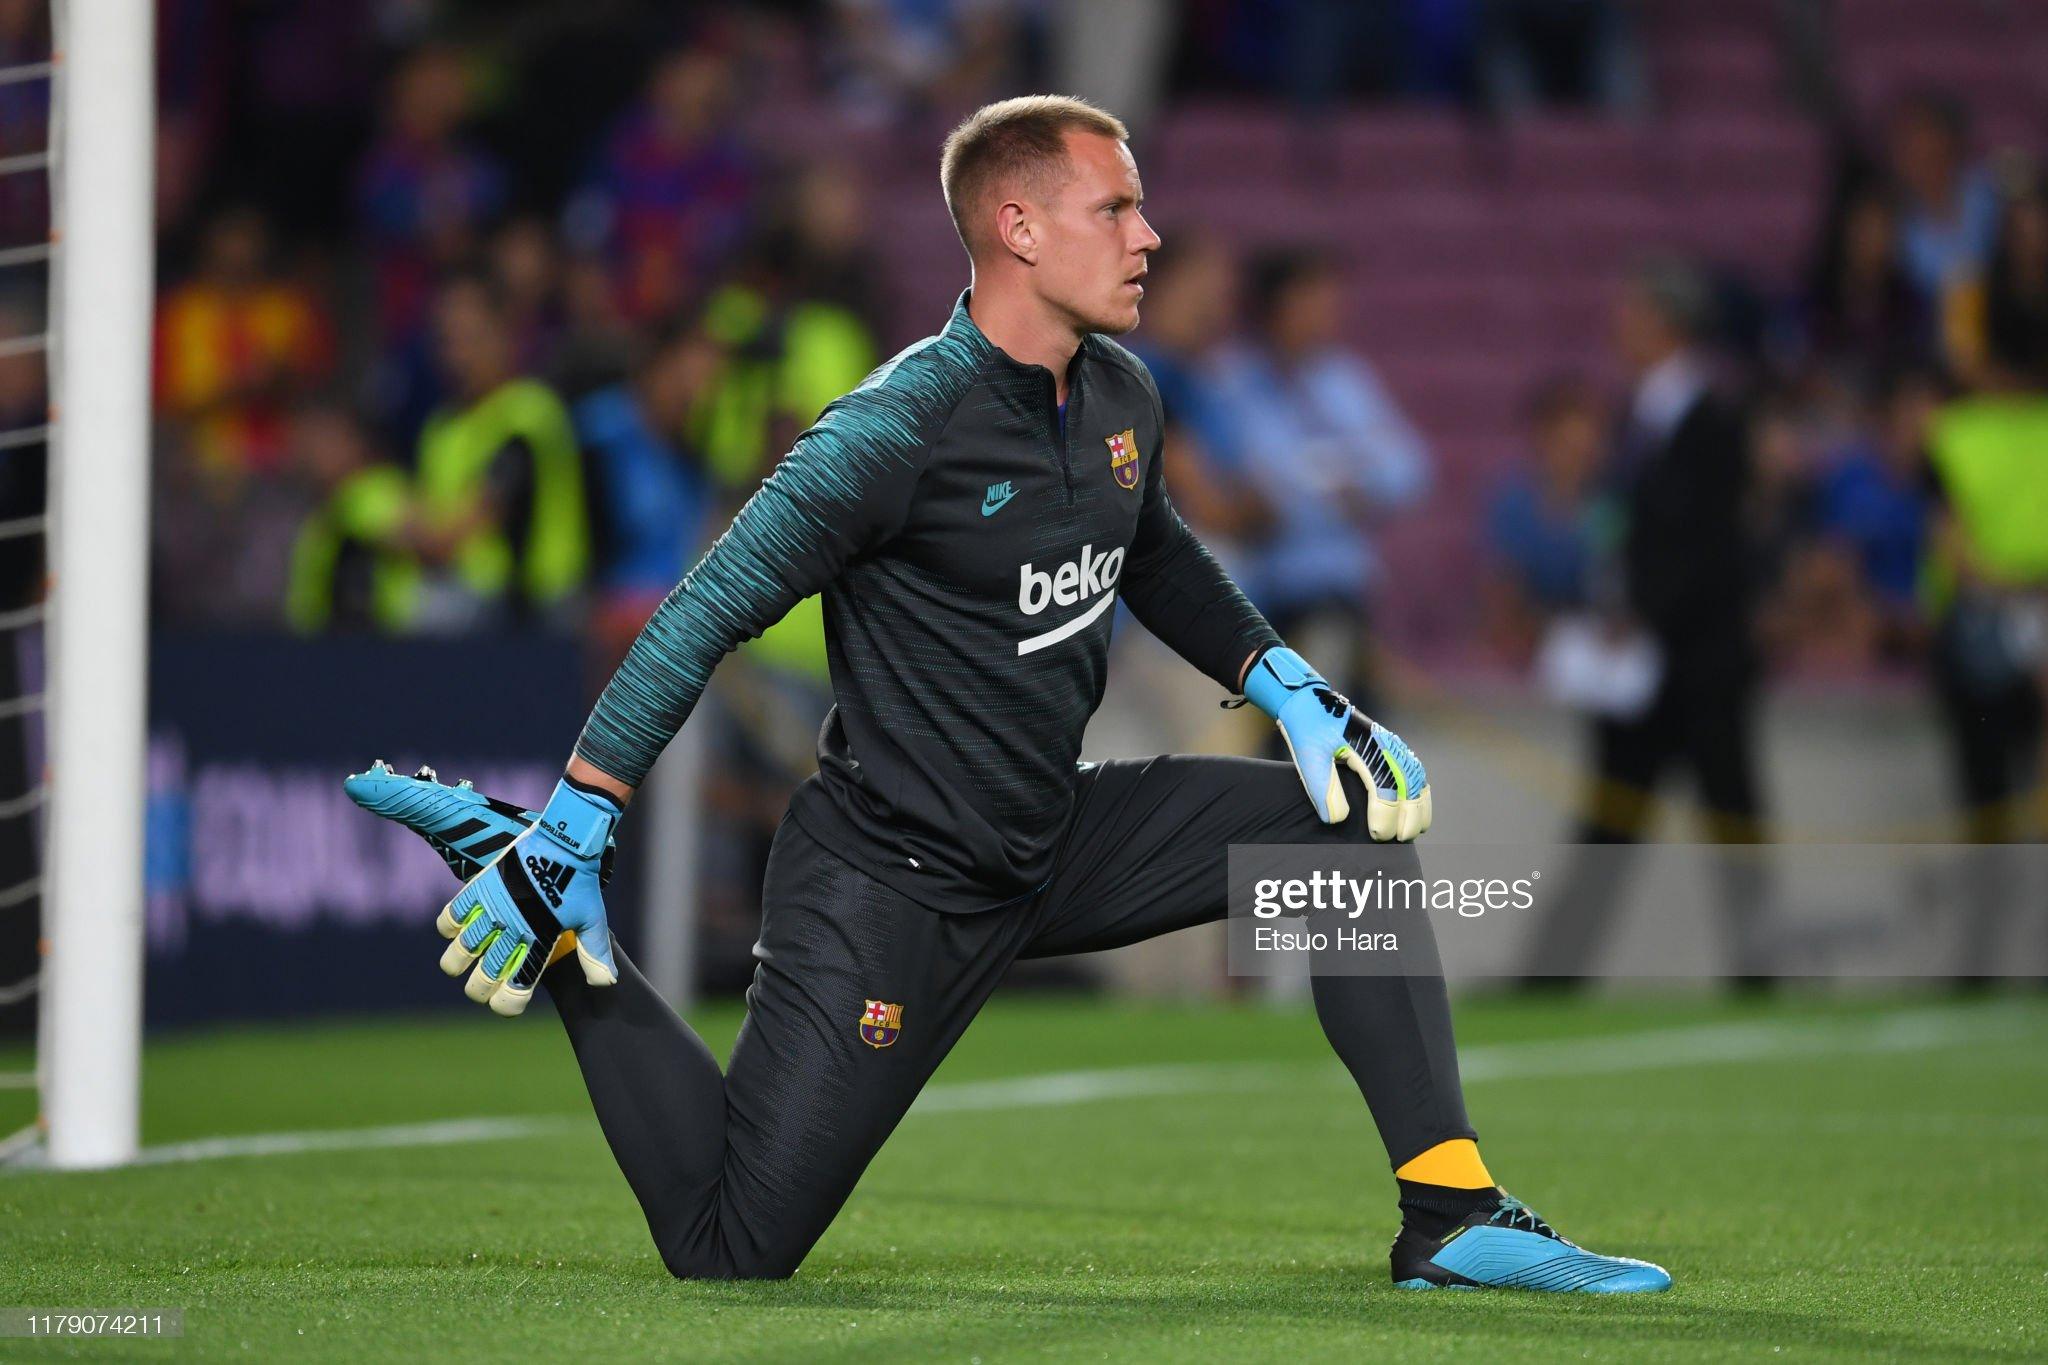 صور مباراة : برشلونة - إنتر 2-1 ( 02-10-2019 )  Marcandre-ter-stegen-of-fc-barcelona-warms-up-prior-to-the-uefa-f-picture-id1179074211?s=2048x2048